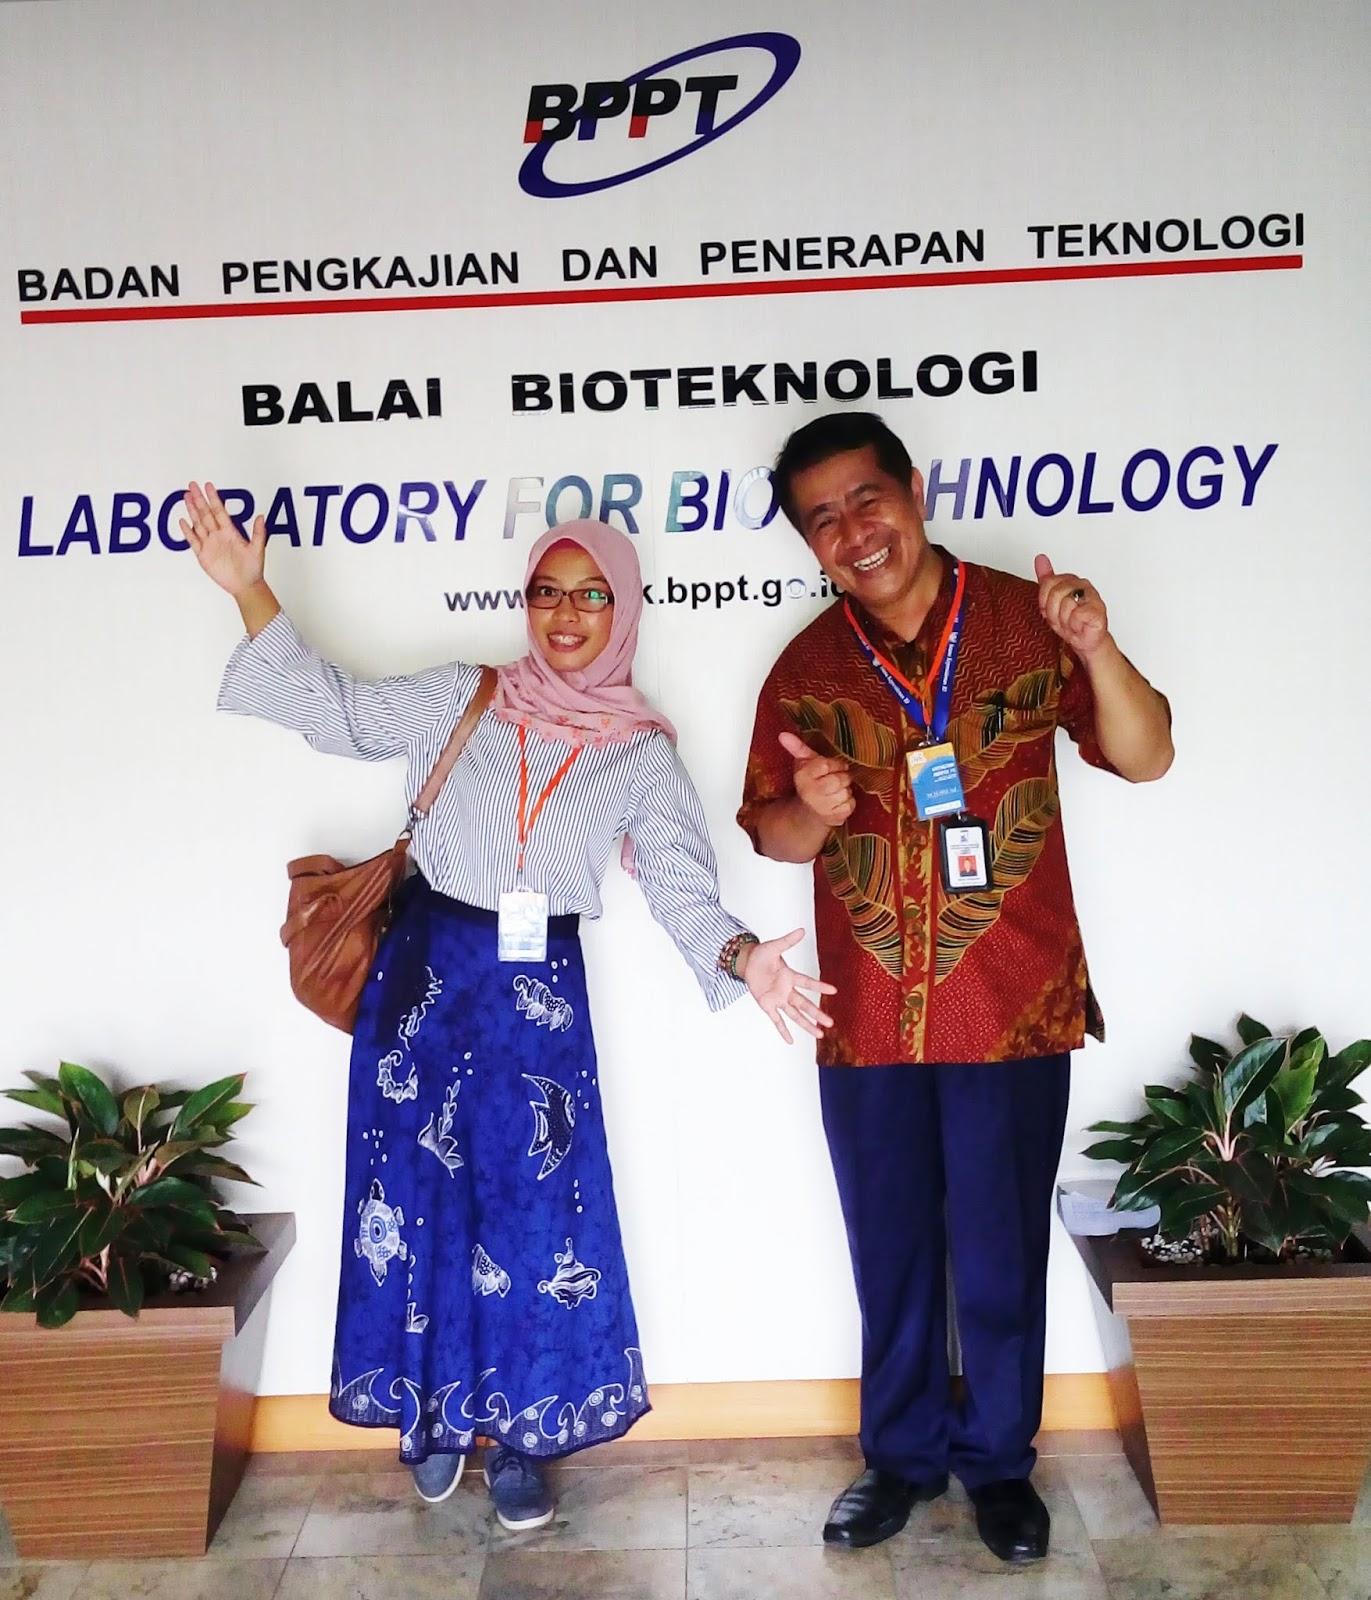 WRITINGTHON PUSPIPTEK 2018: Bioteknologi dan Masa Depan Kedaulatan Pangan Indonesia